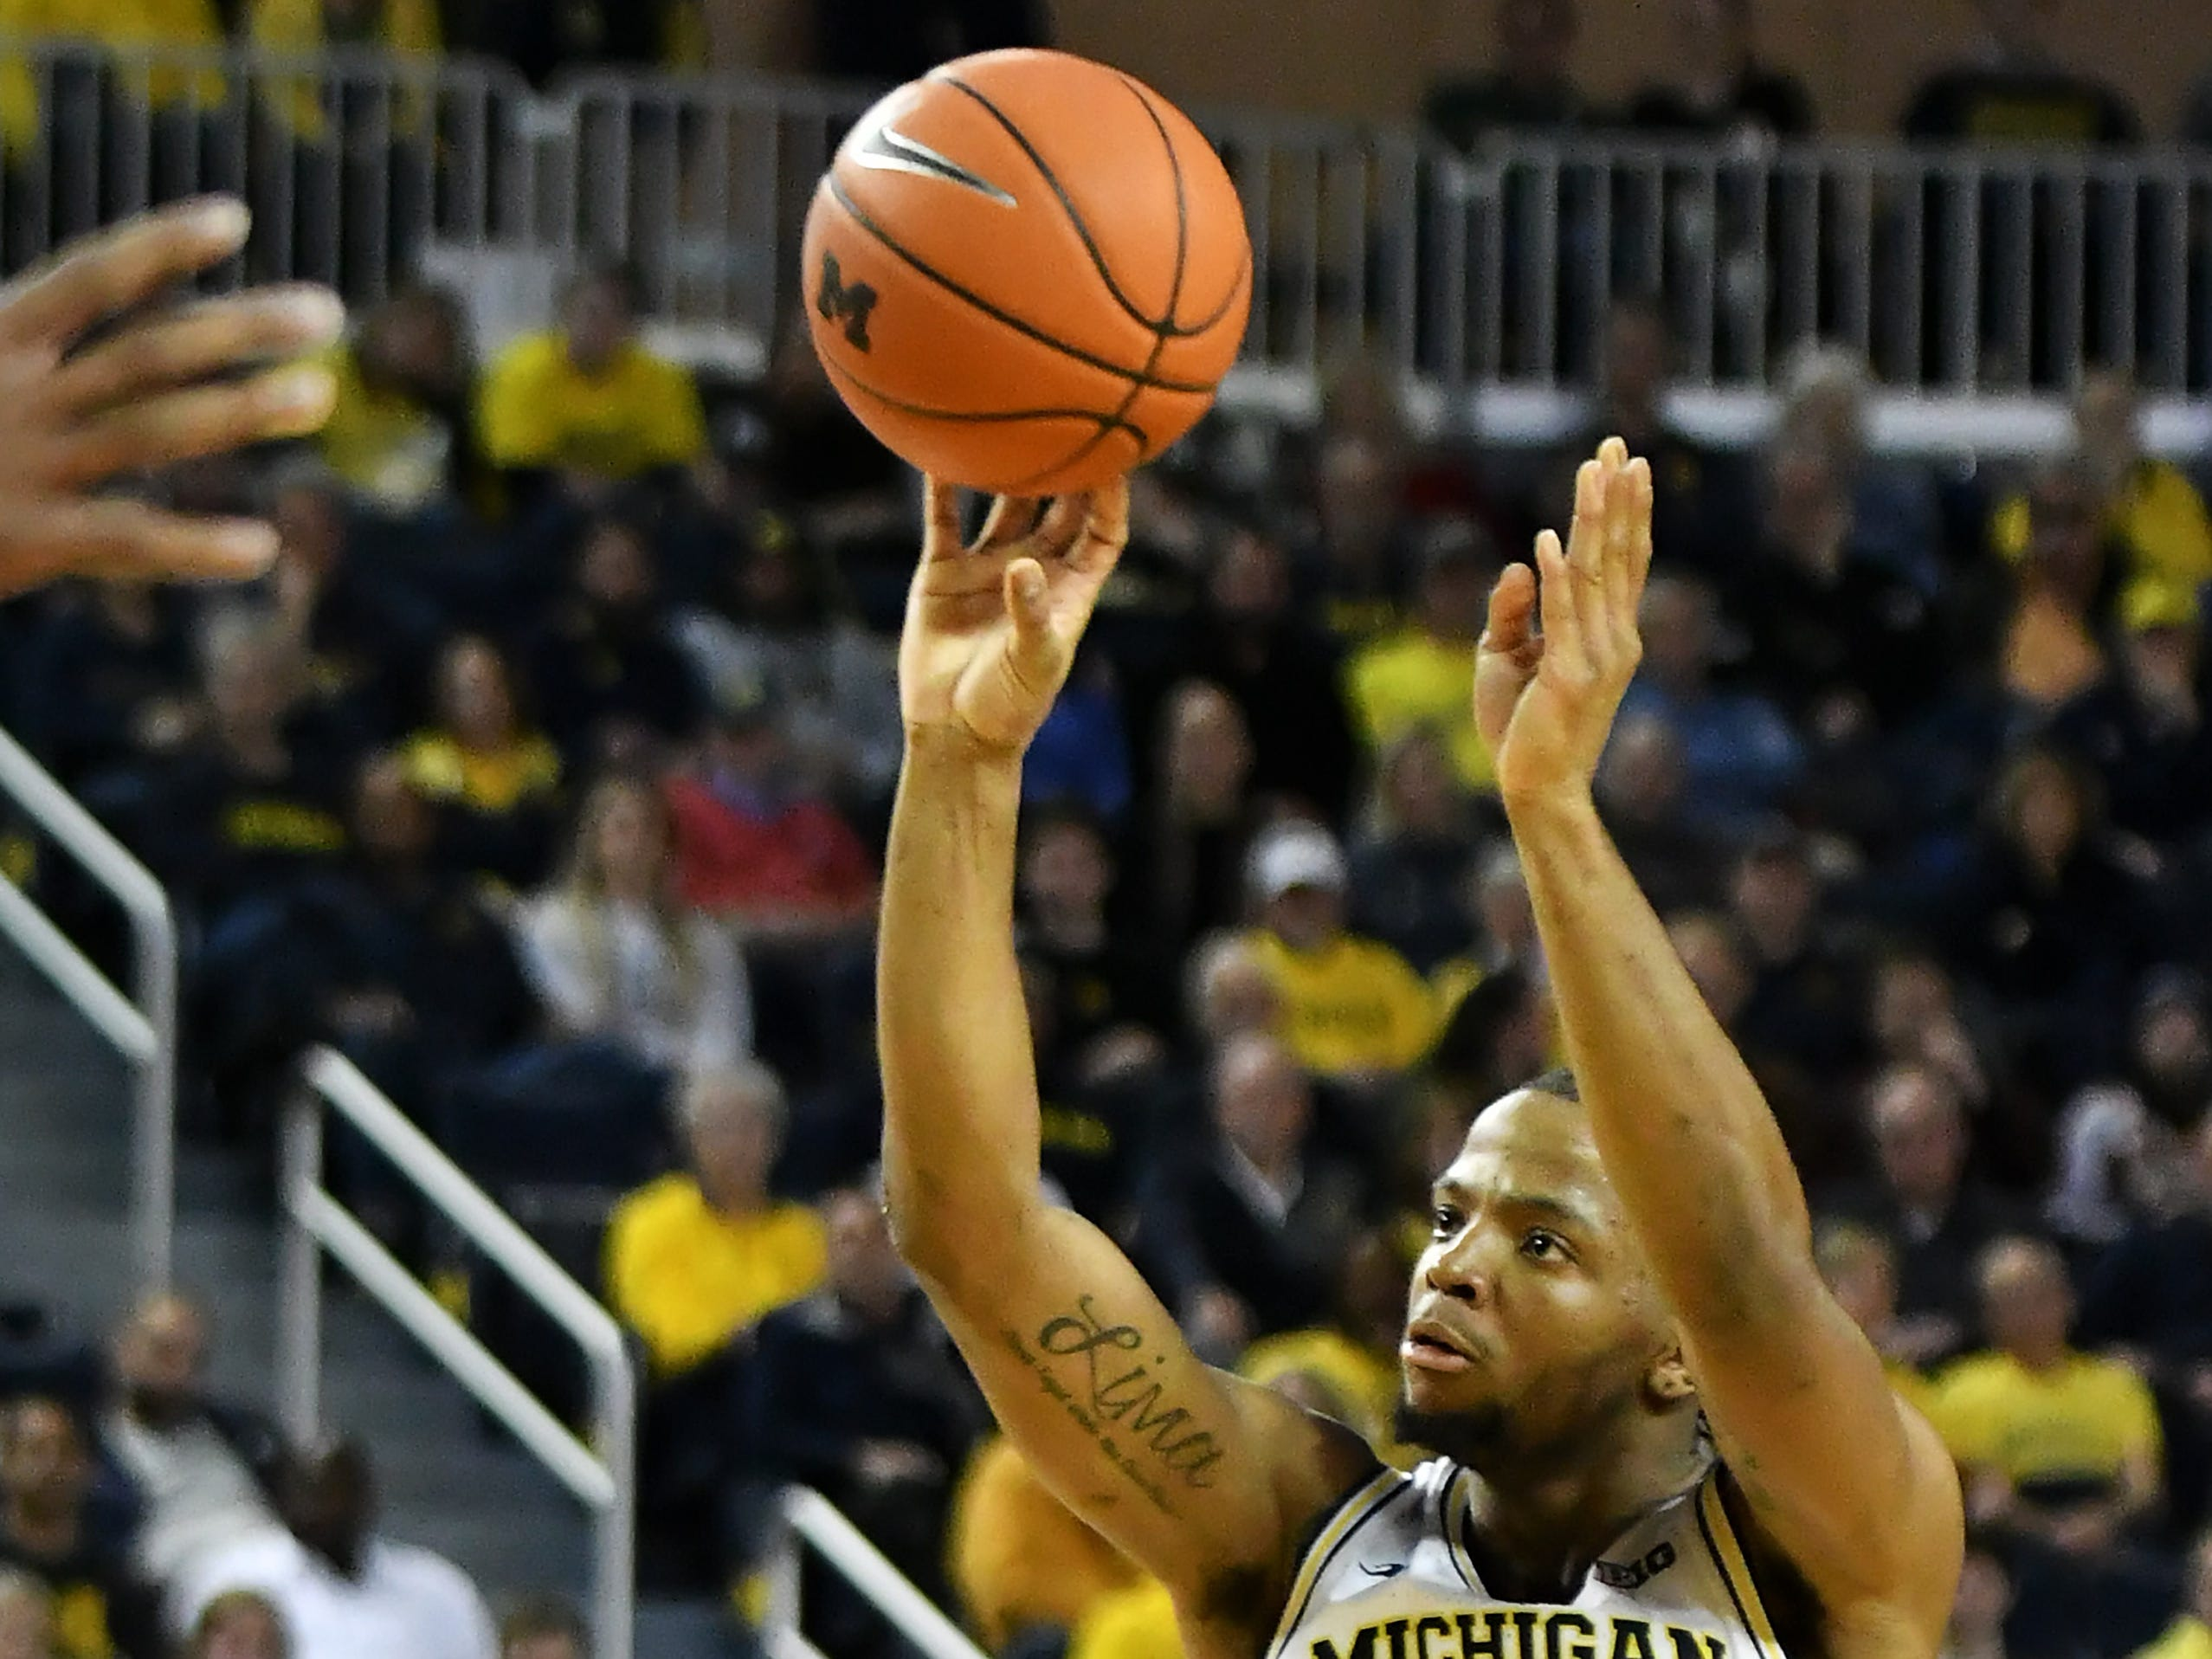 Michigan guard Zavier Simpson (3) takes and hits a three-point shot in the second half.   Michigan vs Western Michigan at Crisler Center in Ann Arbor, Mich. on Dec. 15, 2018.   Michigan wins, 70-62.(Robin Buckson / Detroit News)